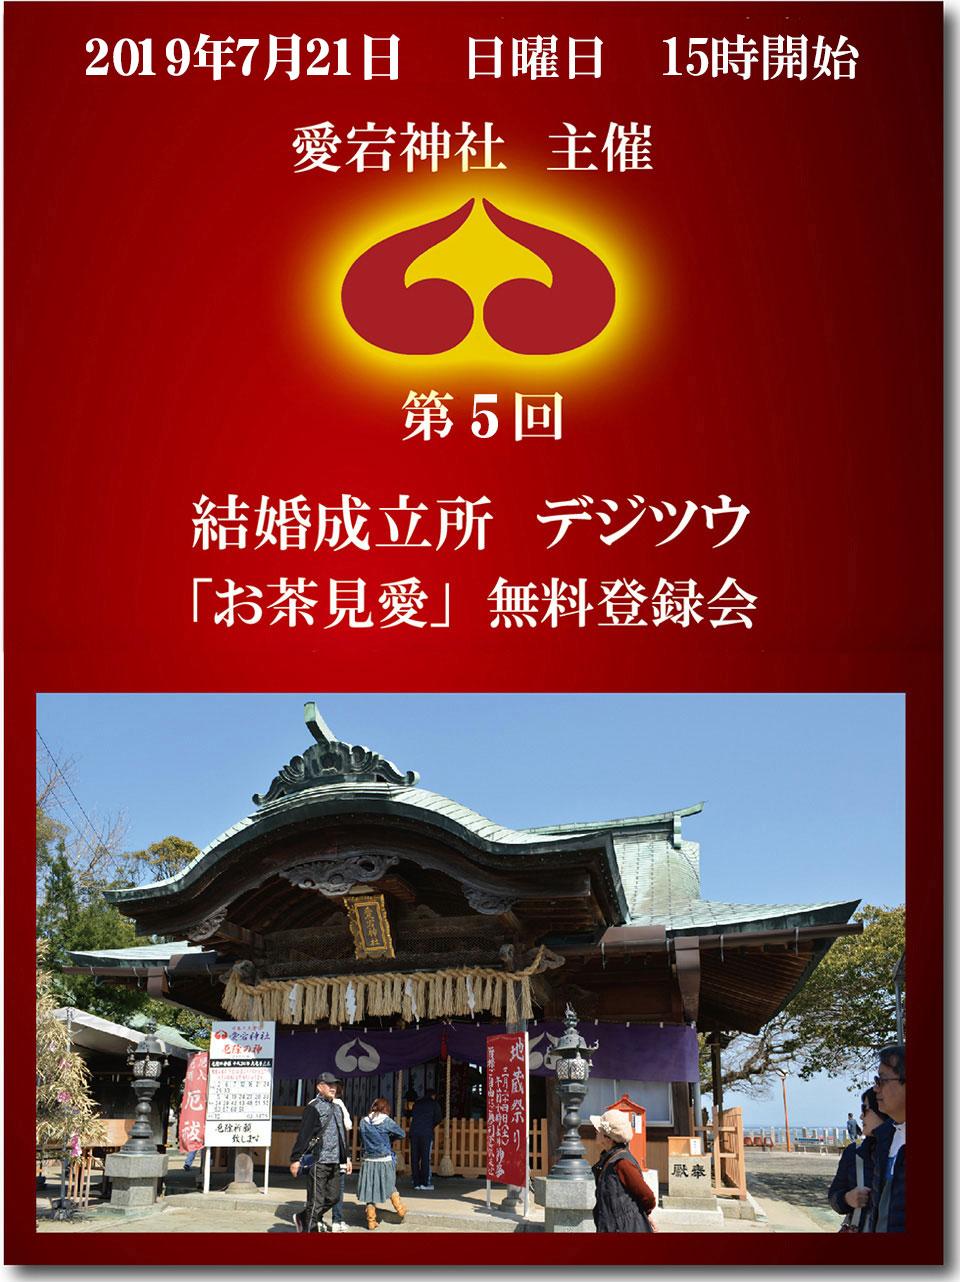 無料 お見合い登録会、愛宕神社